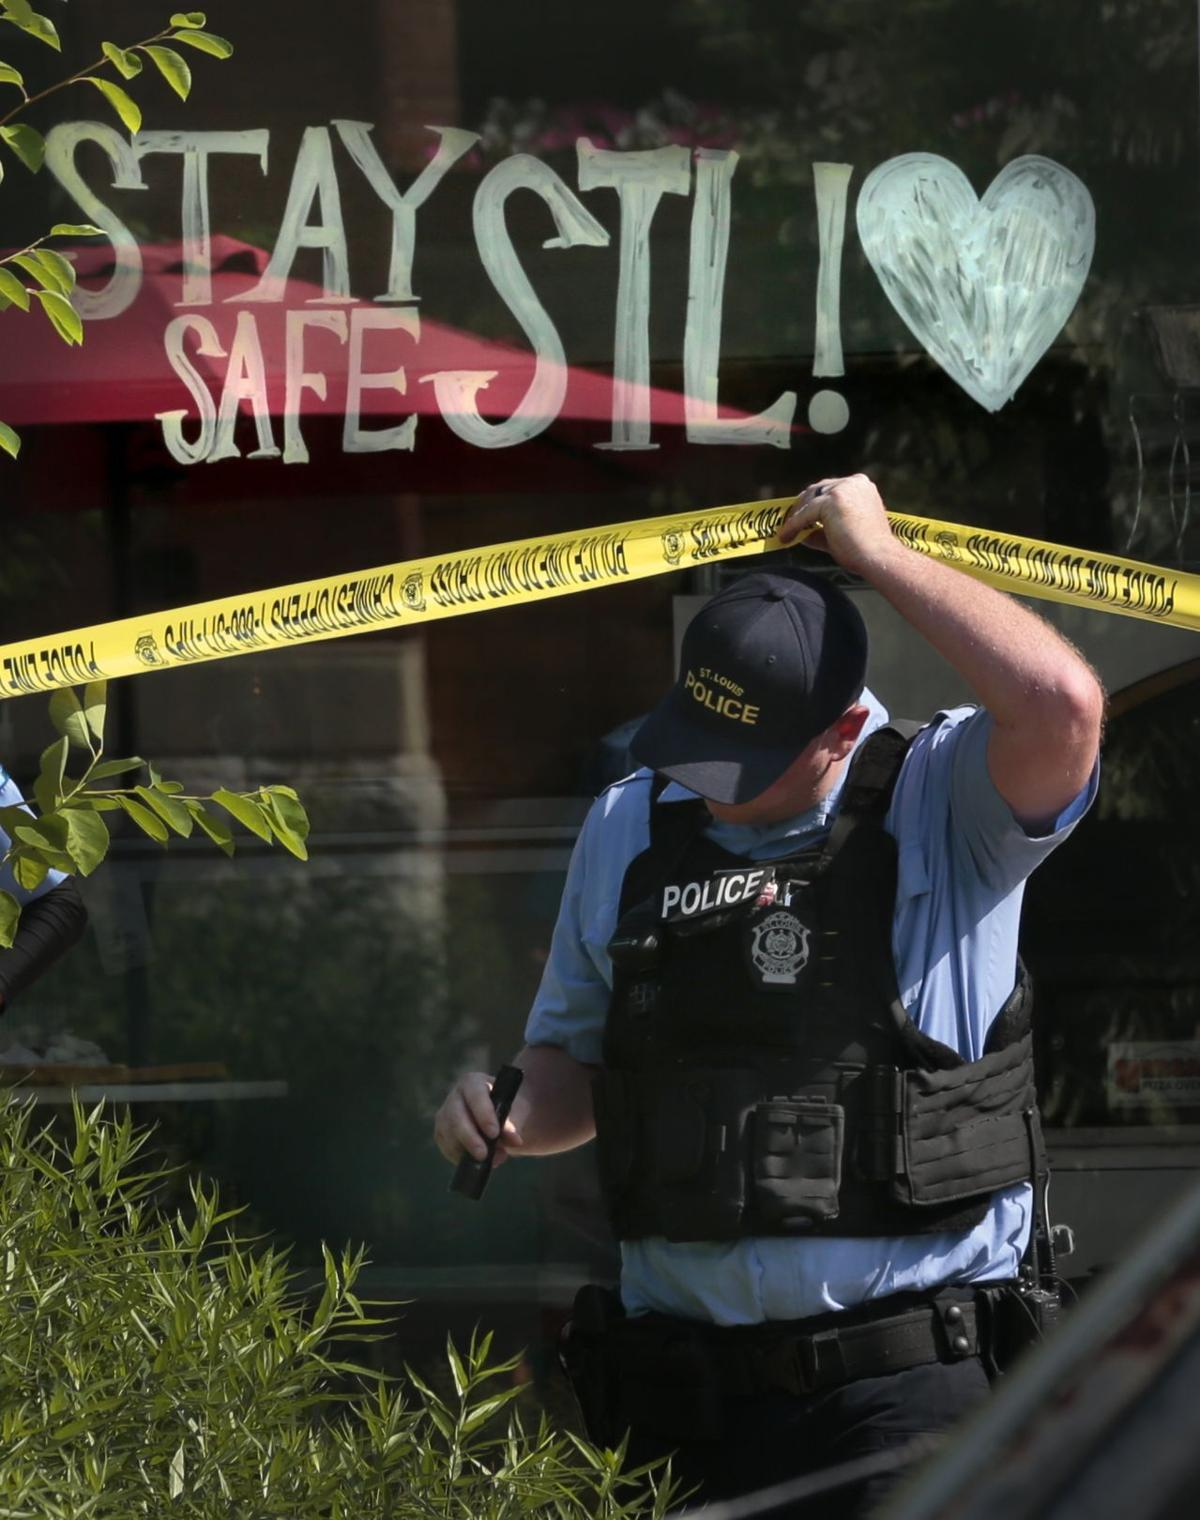 Teen accused of stealing tip jar shot outside Benton Park restaurant